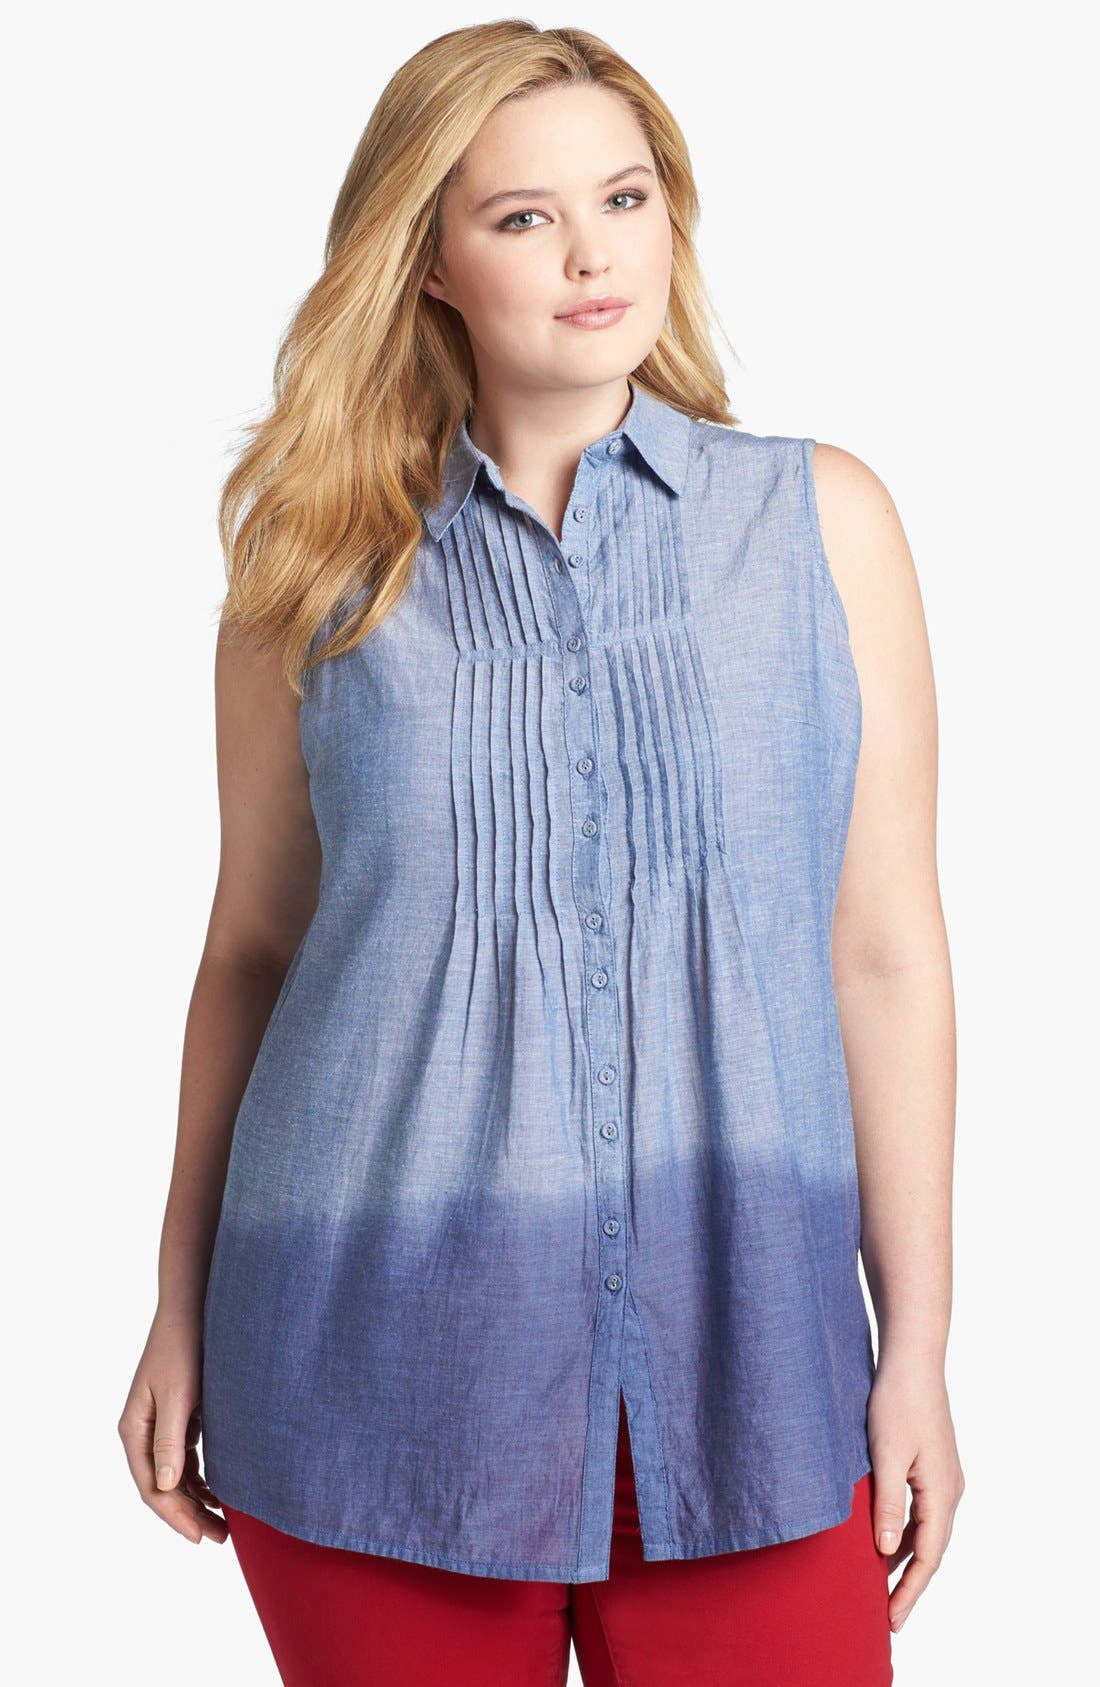 Alternate Image 1 Selected - Evans Pintuck Sleeveless Denim Top (Plus Size)